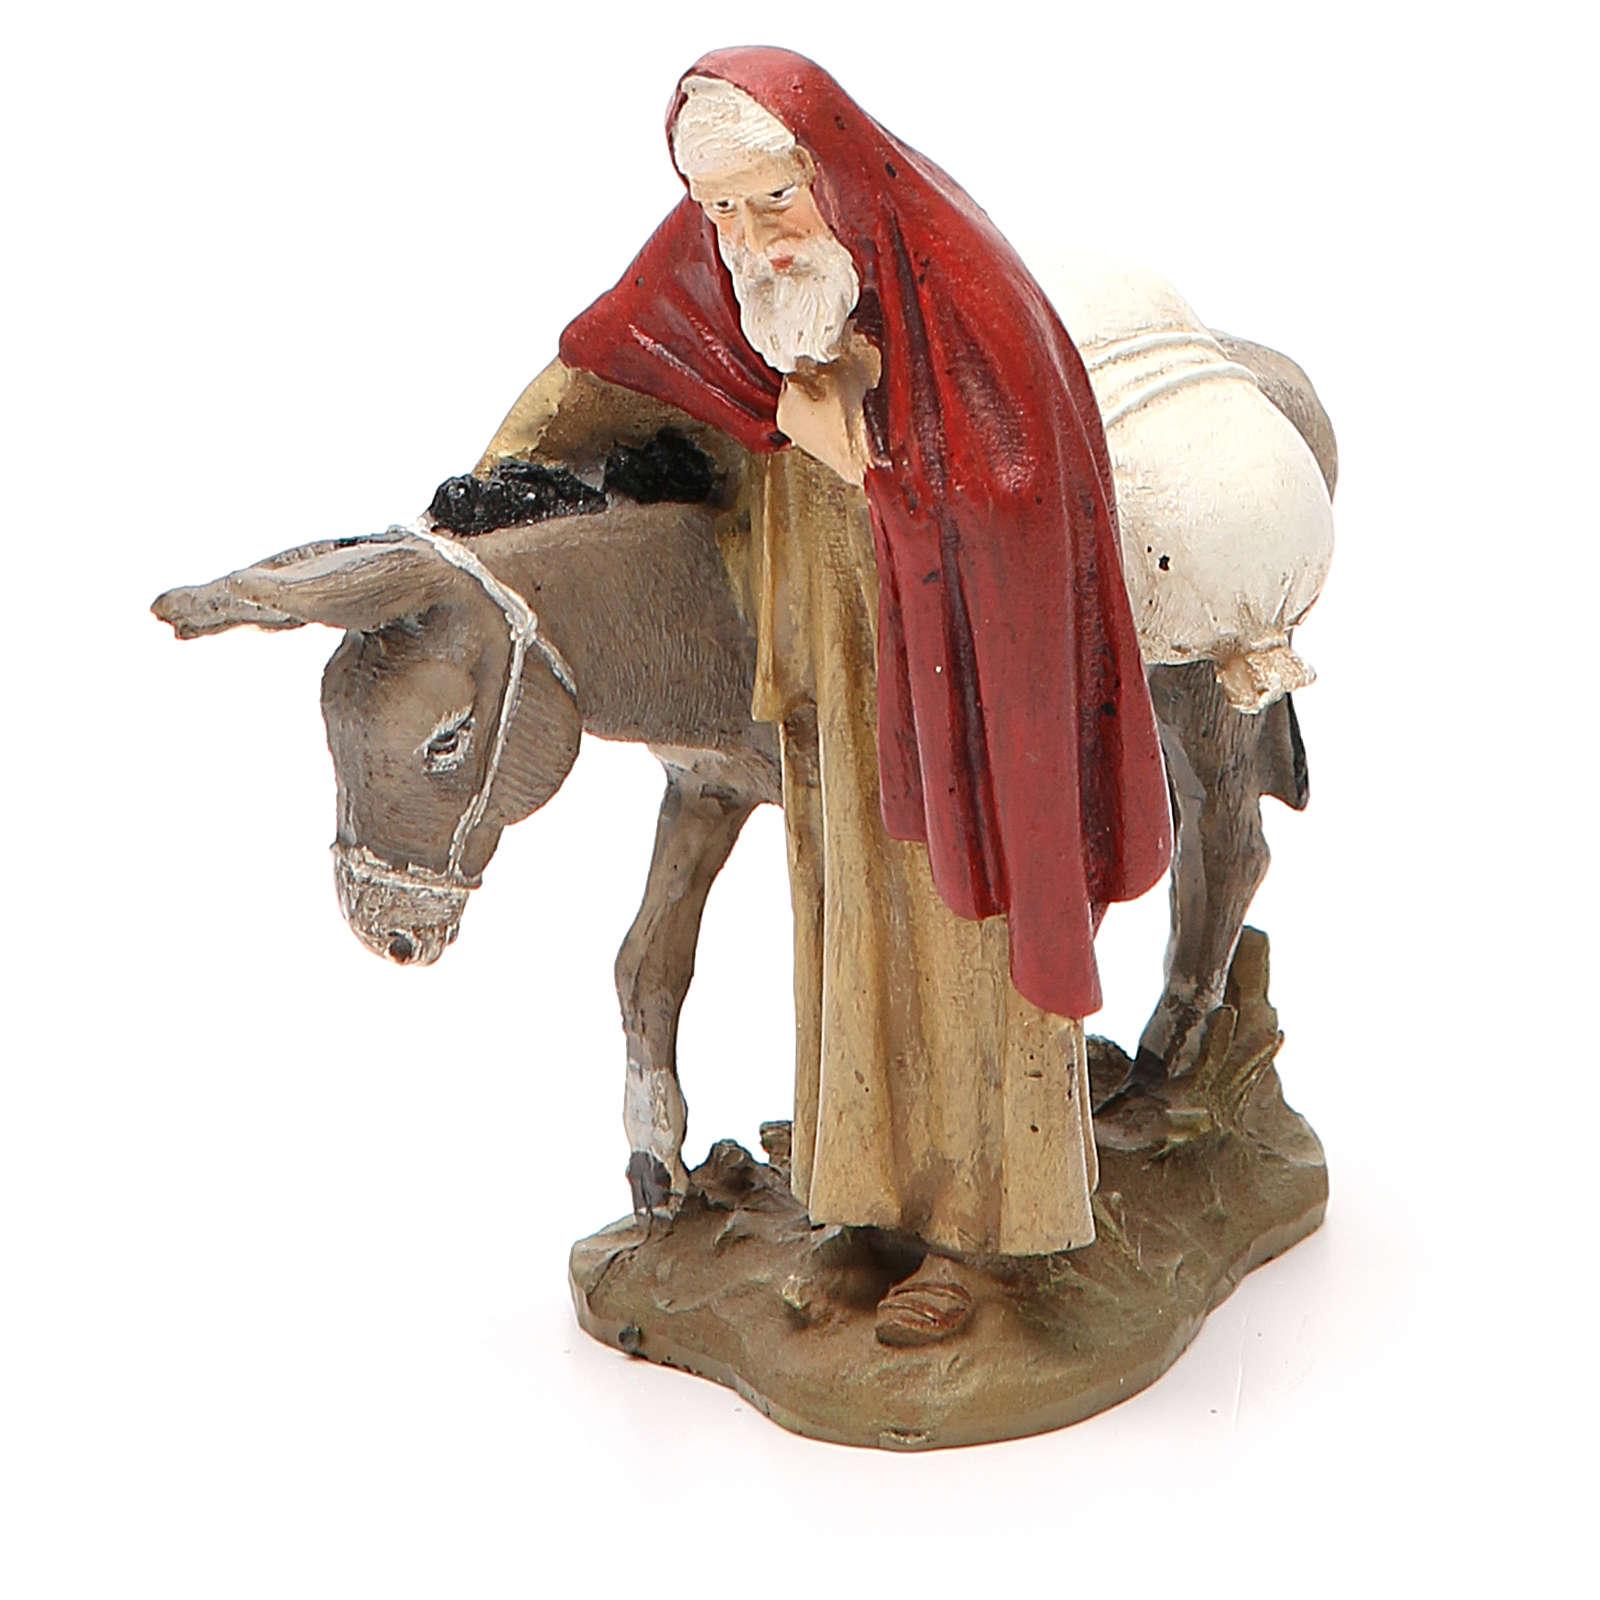 Nativity scene statue wayfarer with donkey in painted resin 10 cm low cost Landi brand 3